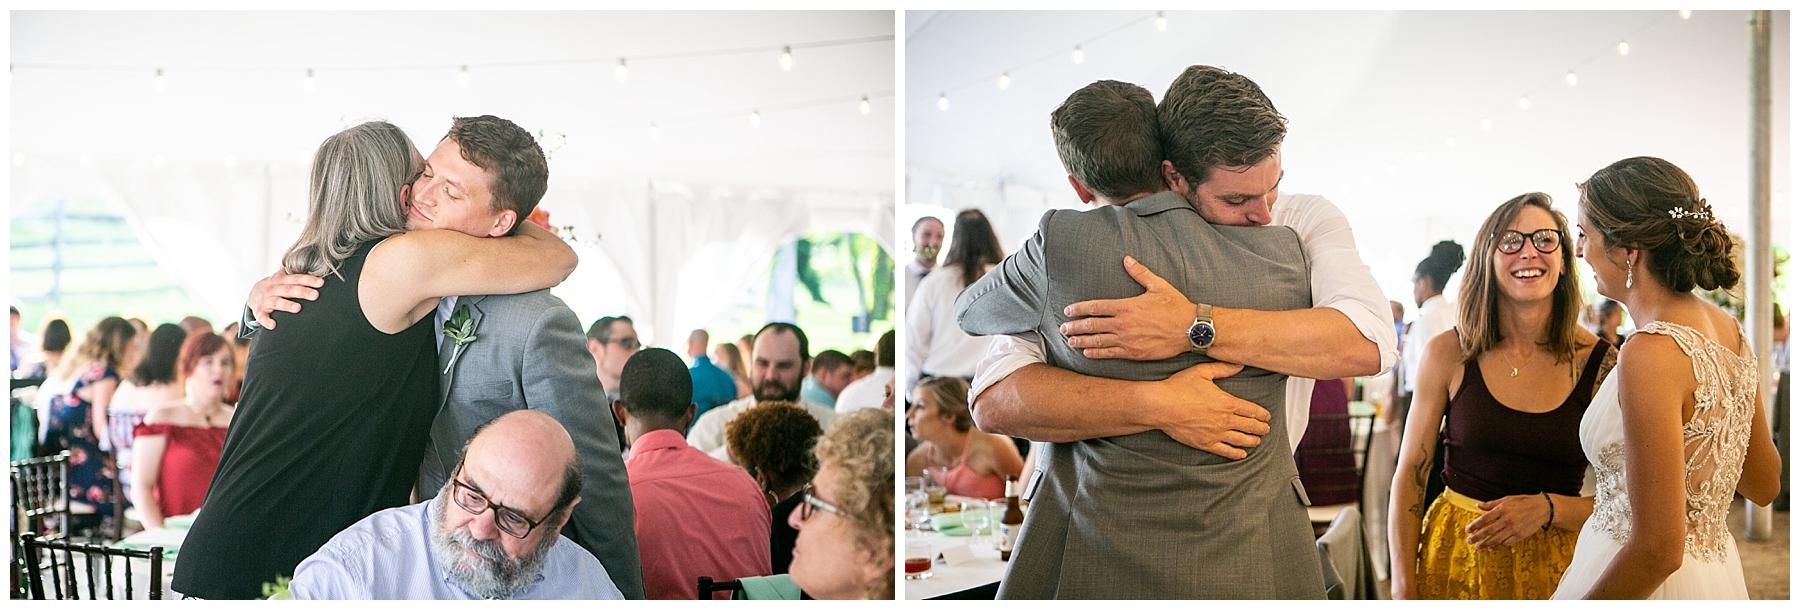 Chelsea Phil Bohemia River Overlook Wedding Living Radiant Photography photos_0159.jpg